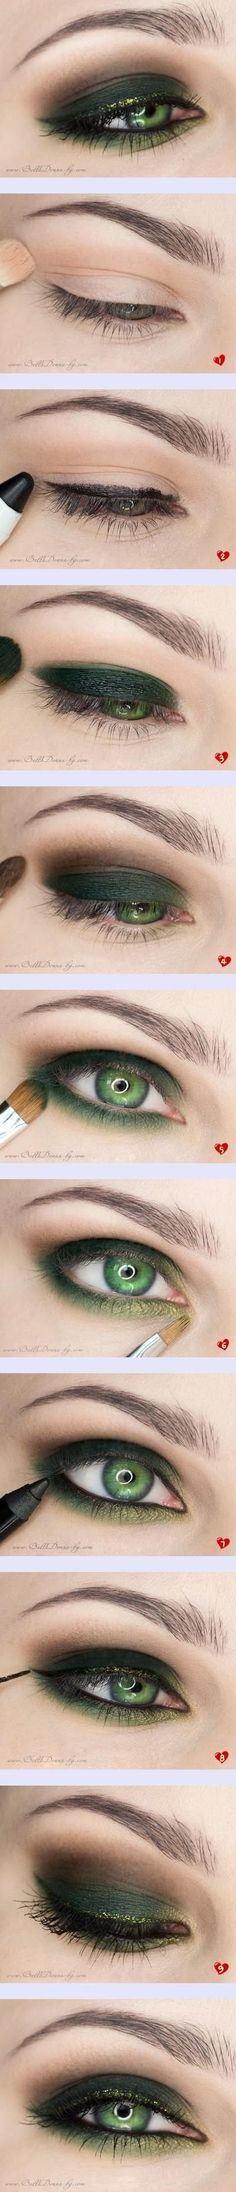 St. Patrick's Day eyeshadow